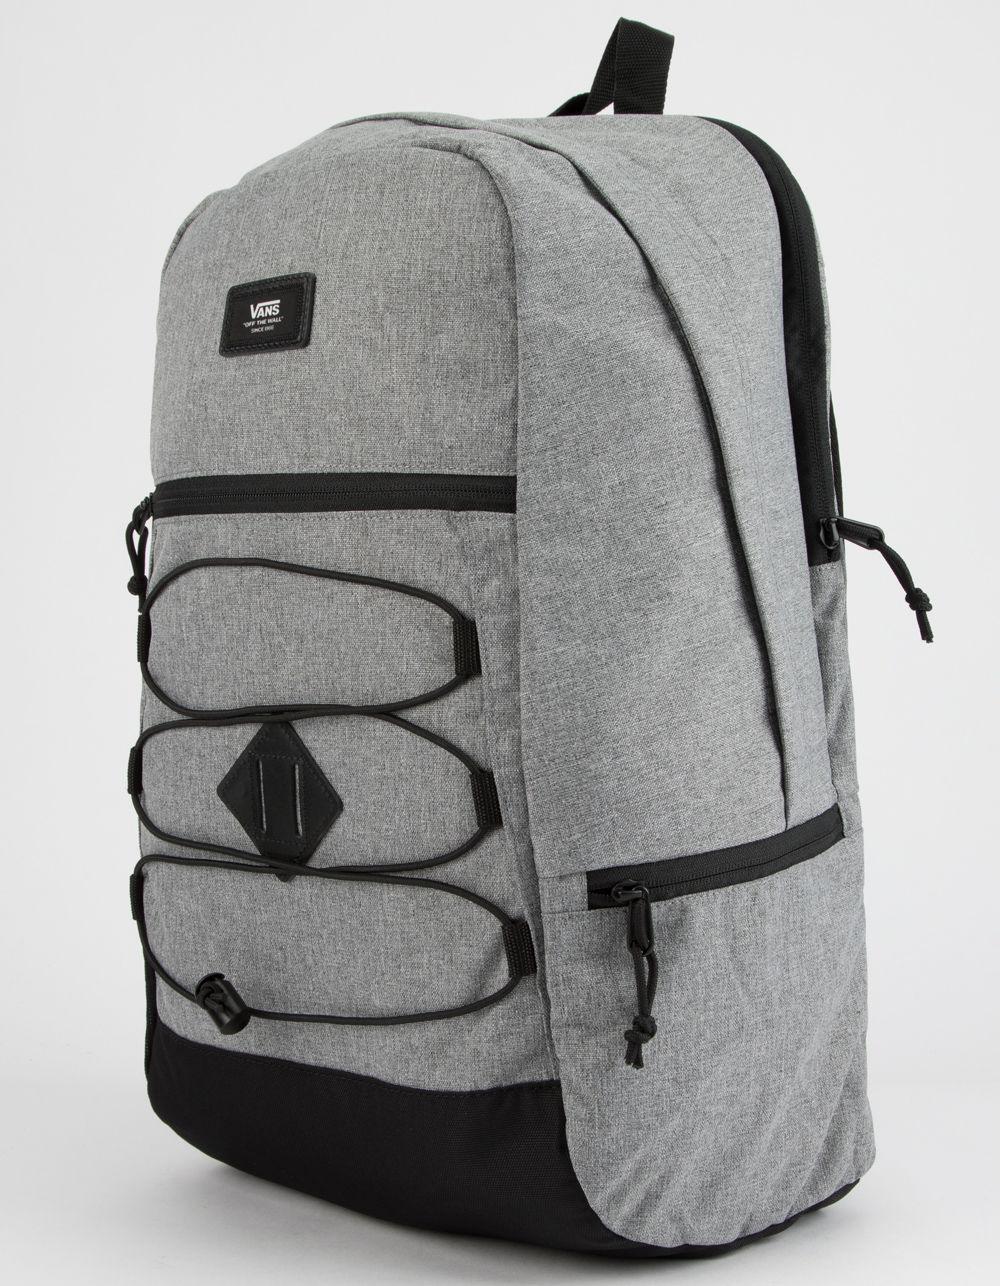 fc1fe4640c4 Lyst - Vans Snag Plus Backpack - in Gray for Men - Save 42%